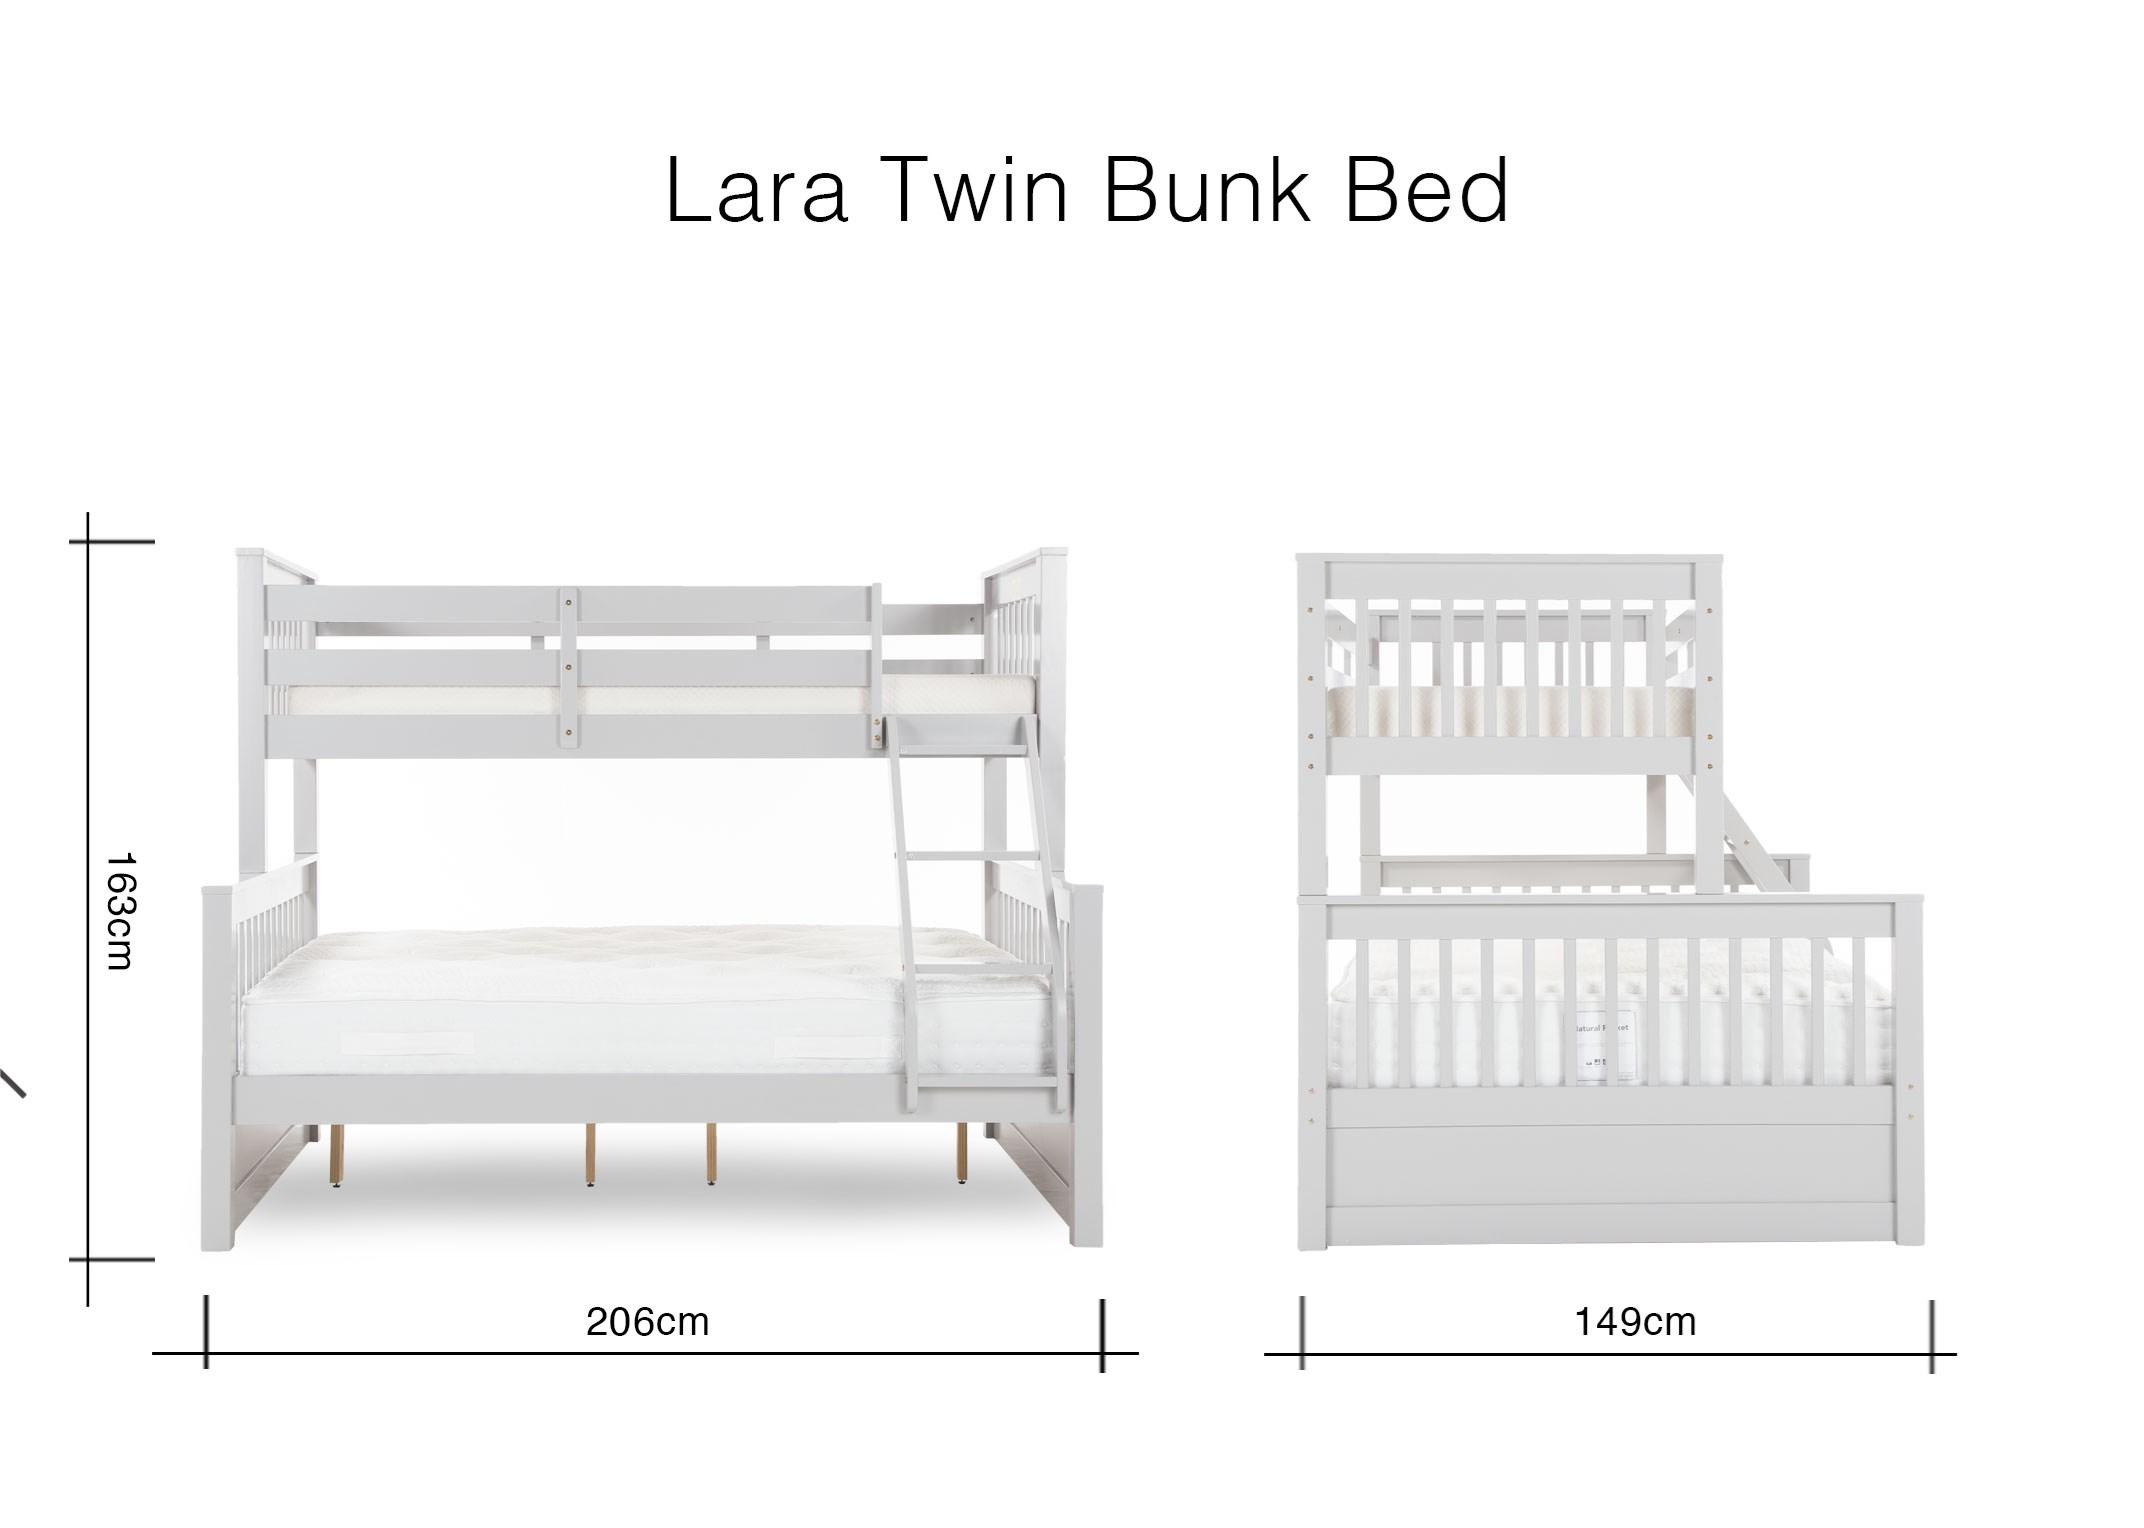 Grey Solid Wood Twin Bunk Bed Lara Ez Living Furniture